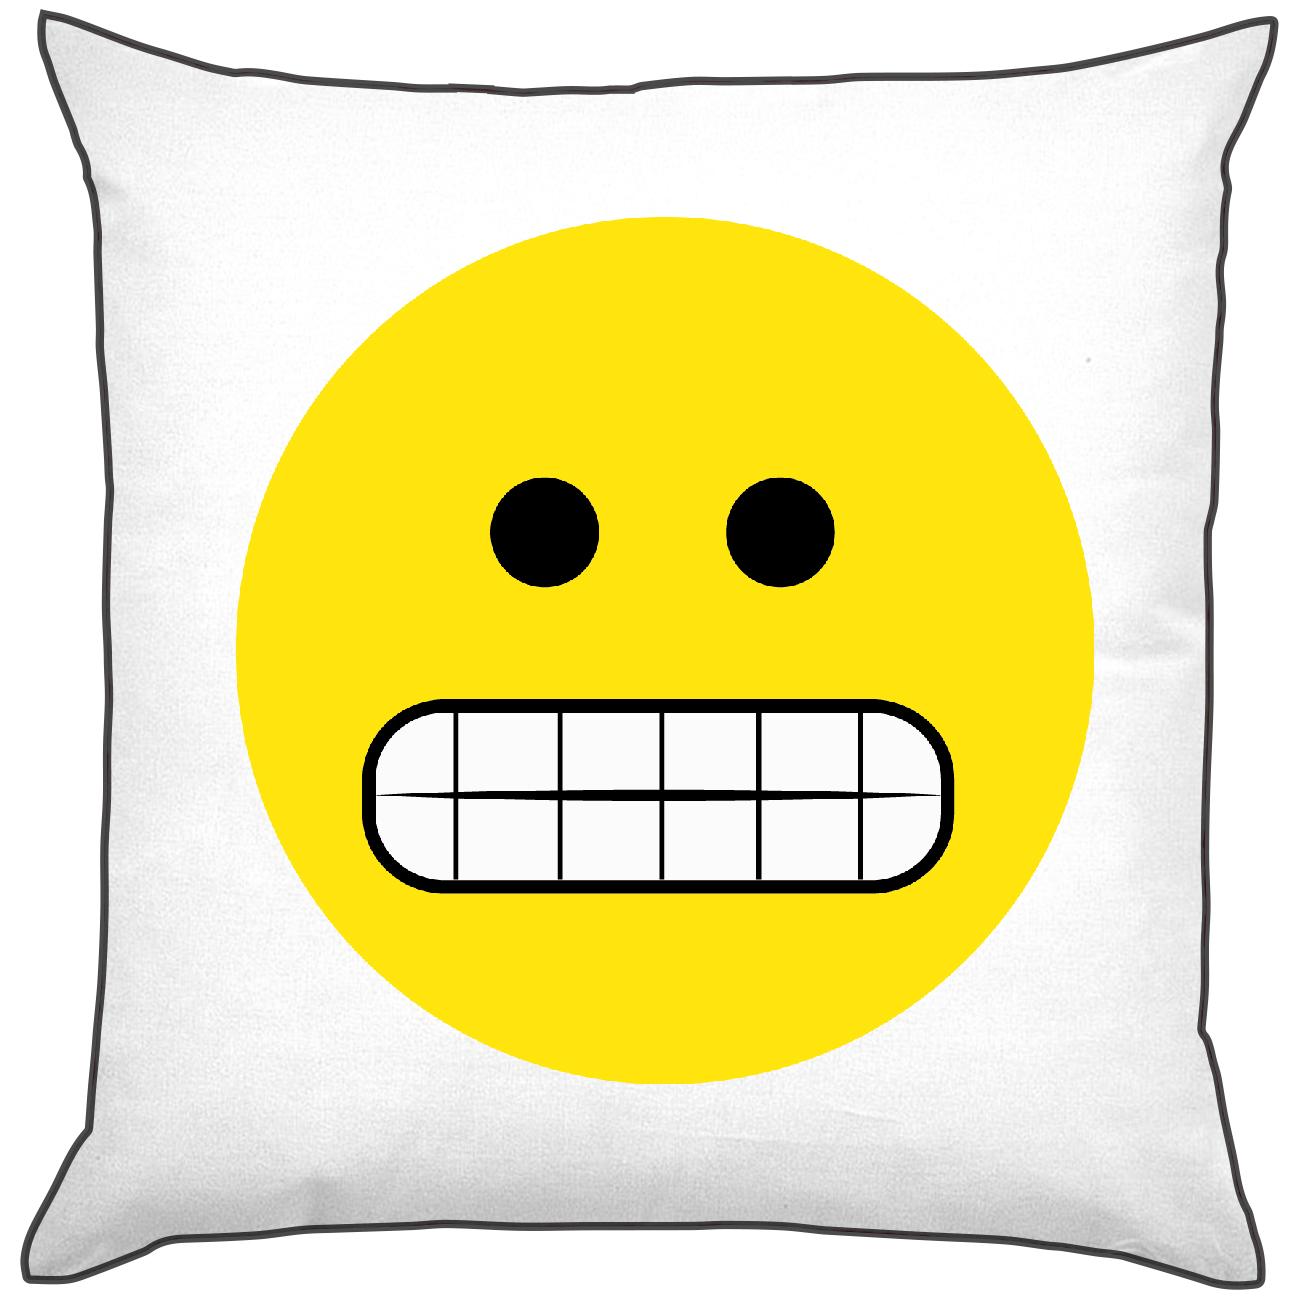 Cuscini Emoticon.Cuscini Poliestere E Cotone Smile Risatona Mycustomstyle